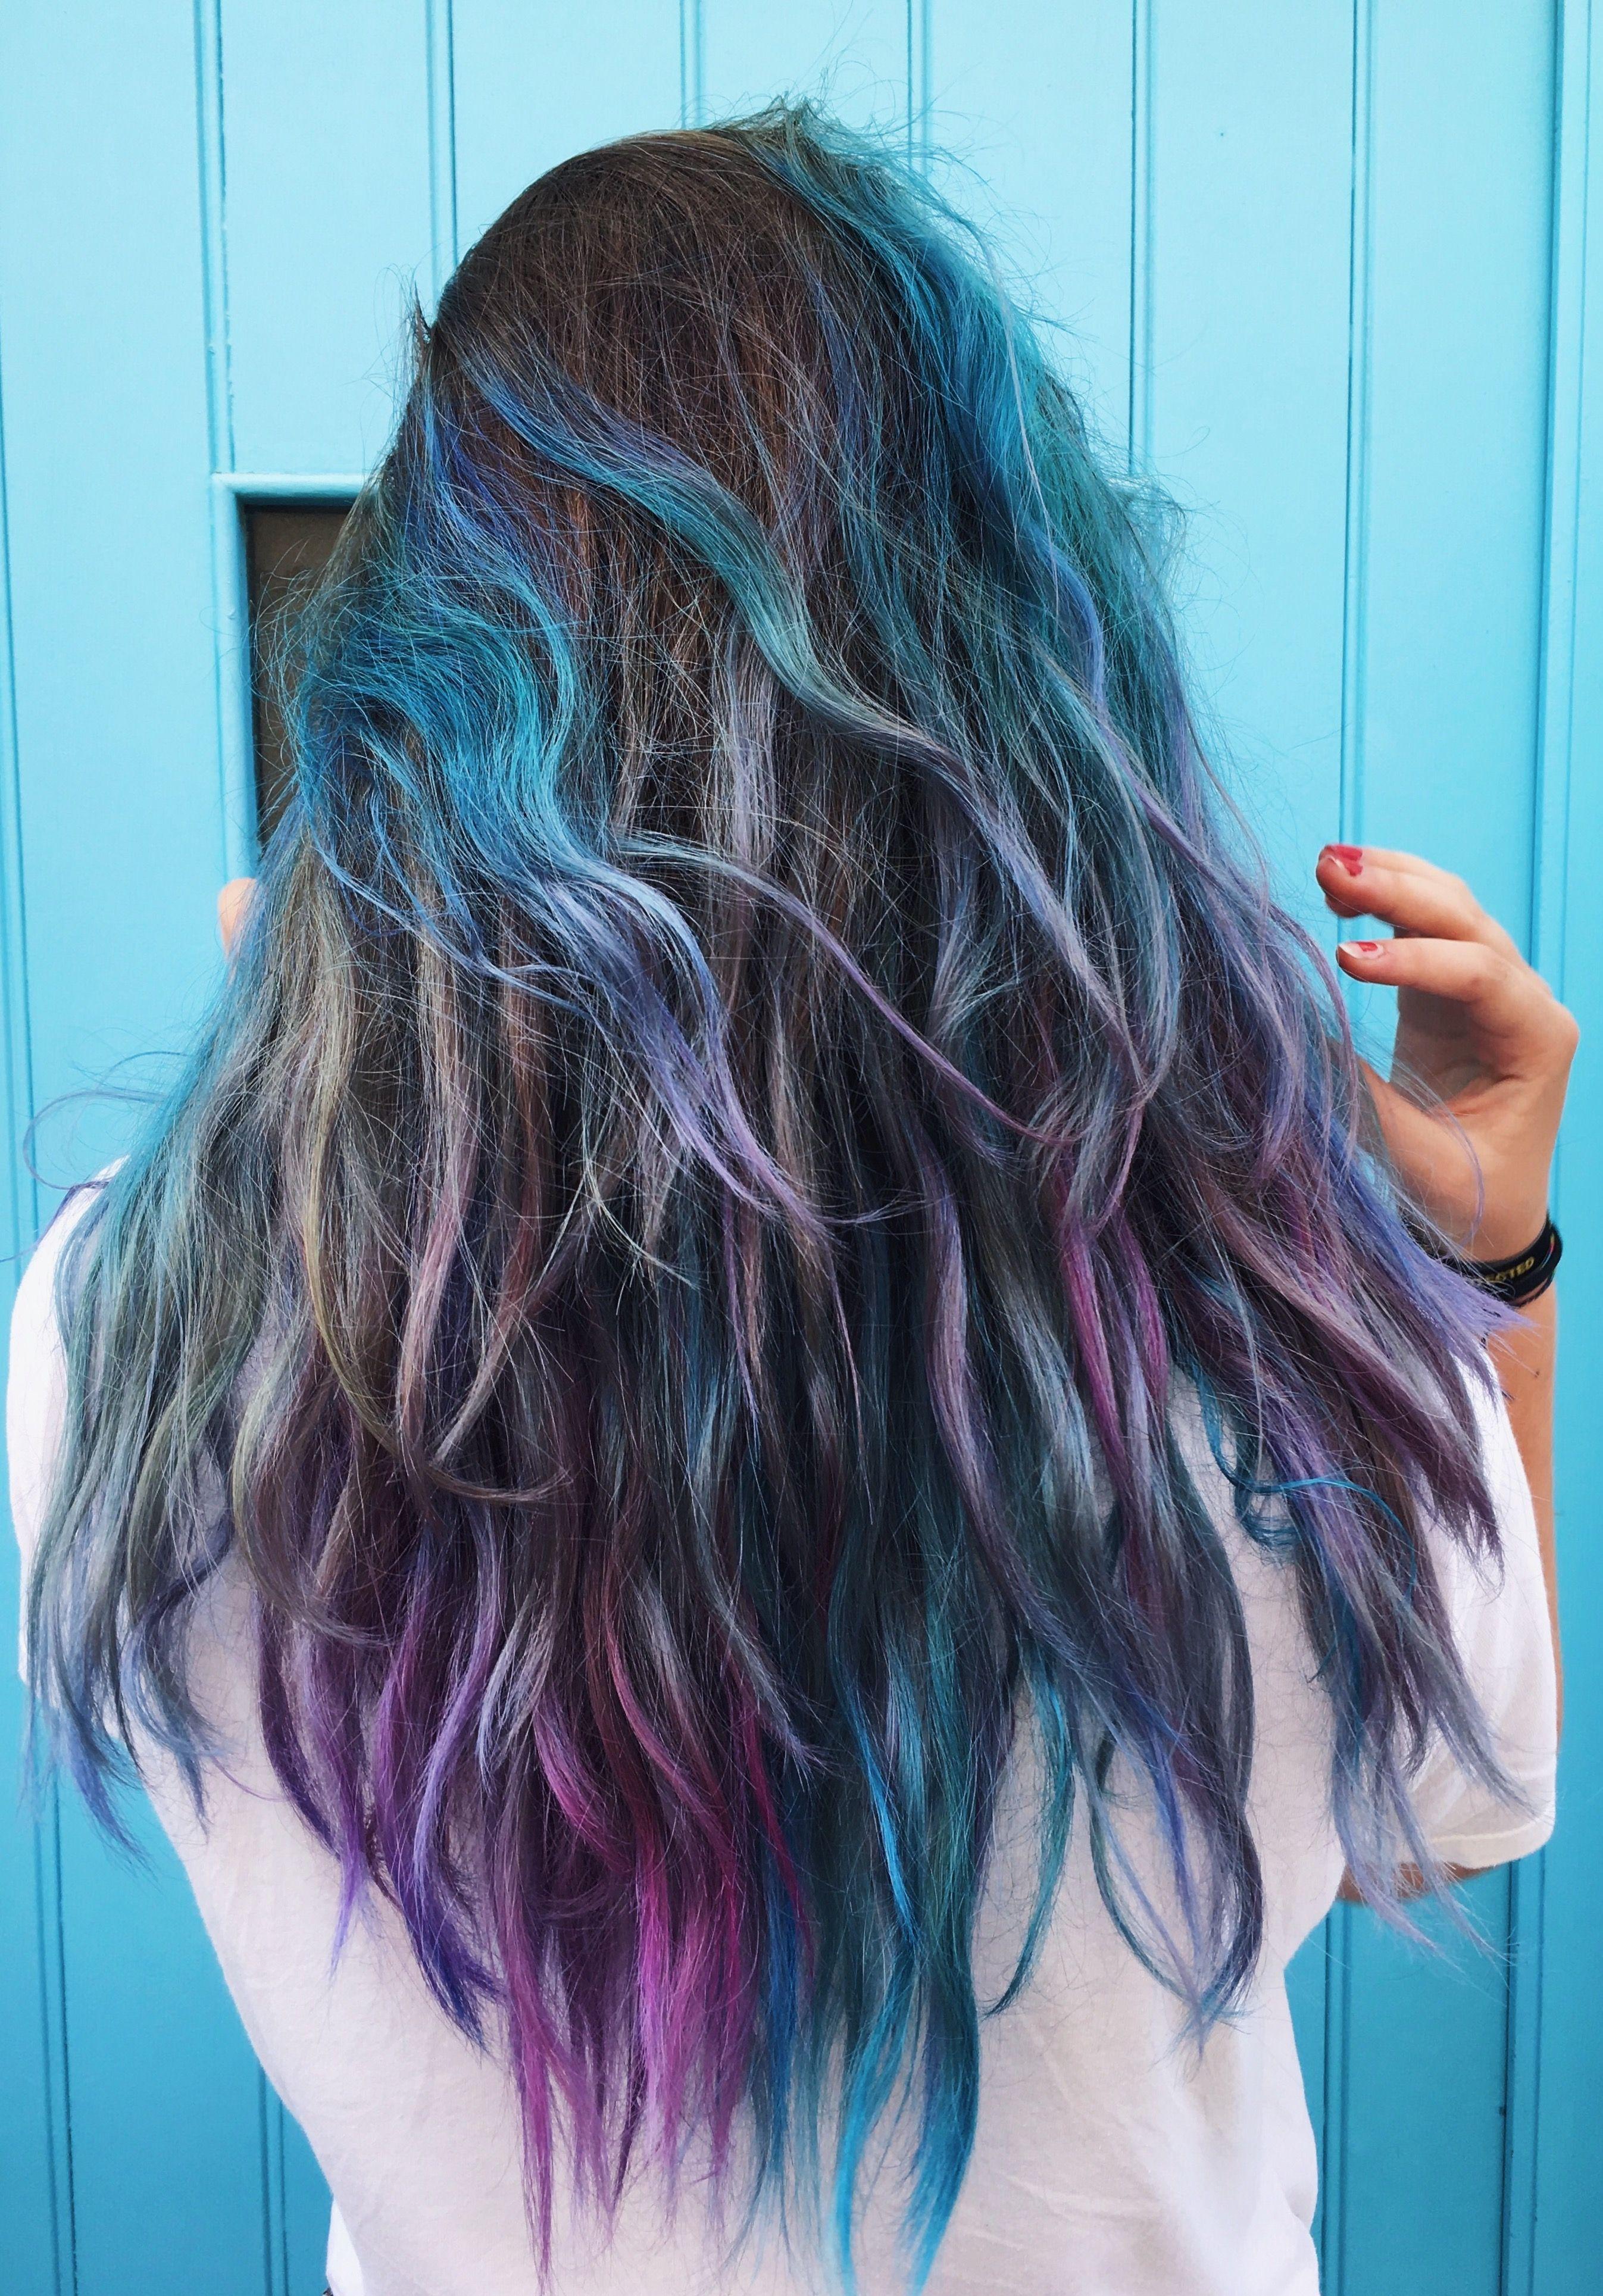 Colorful Hair Crazycolor Instafelizx Hair Inspo Pinterest